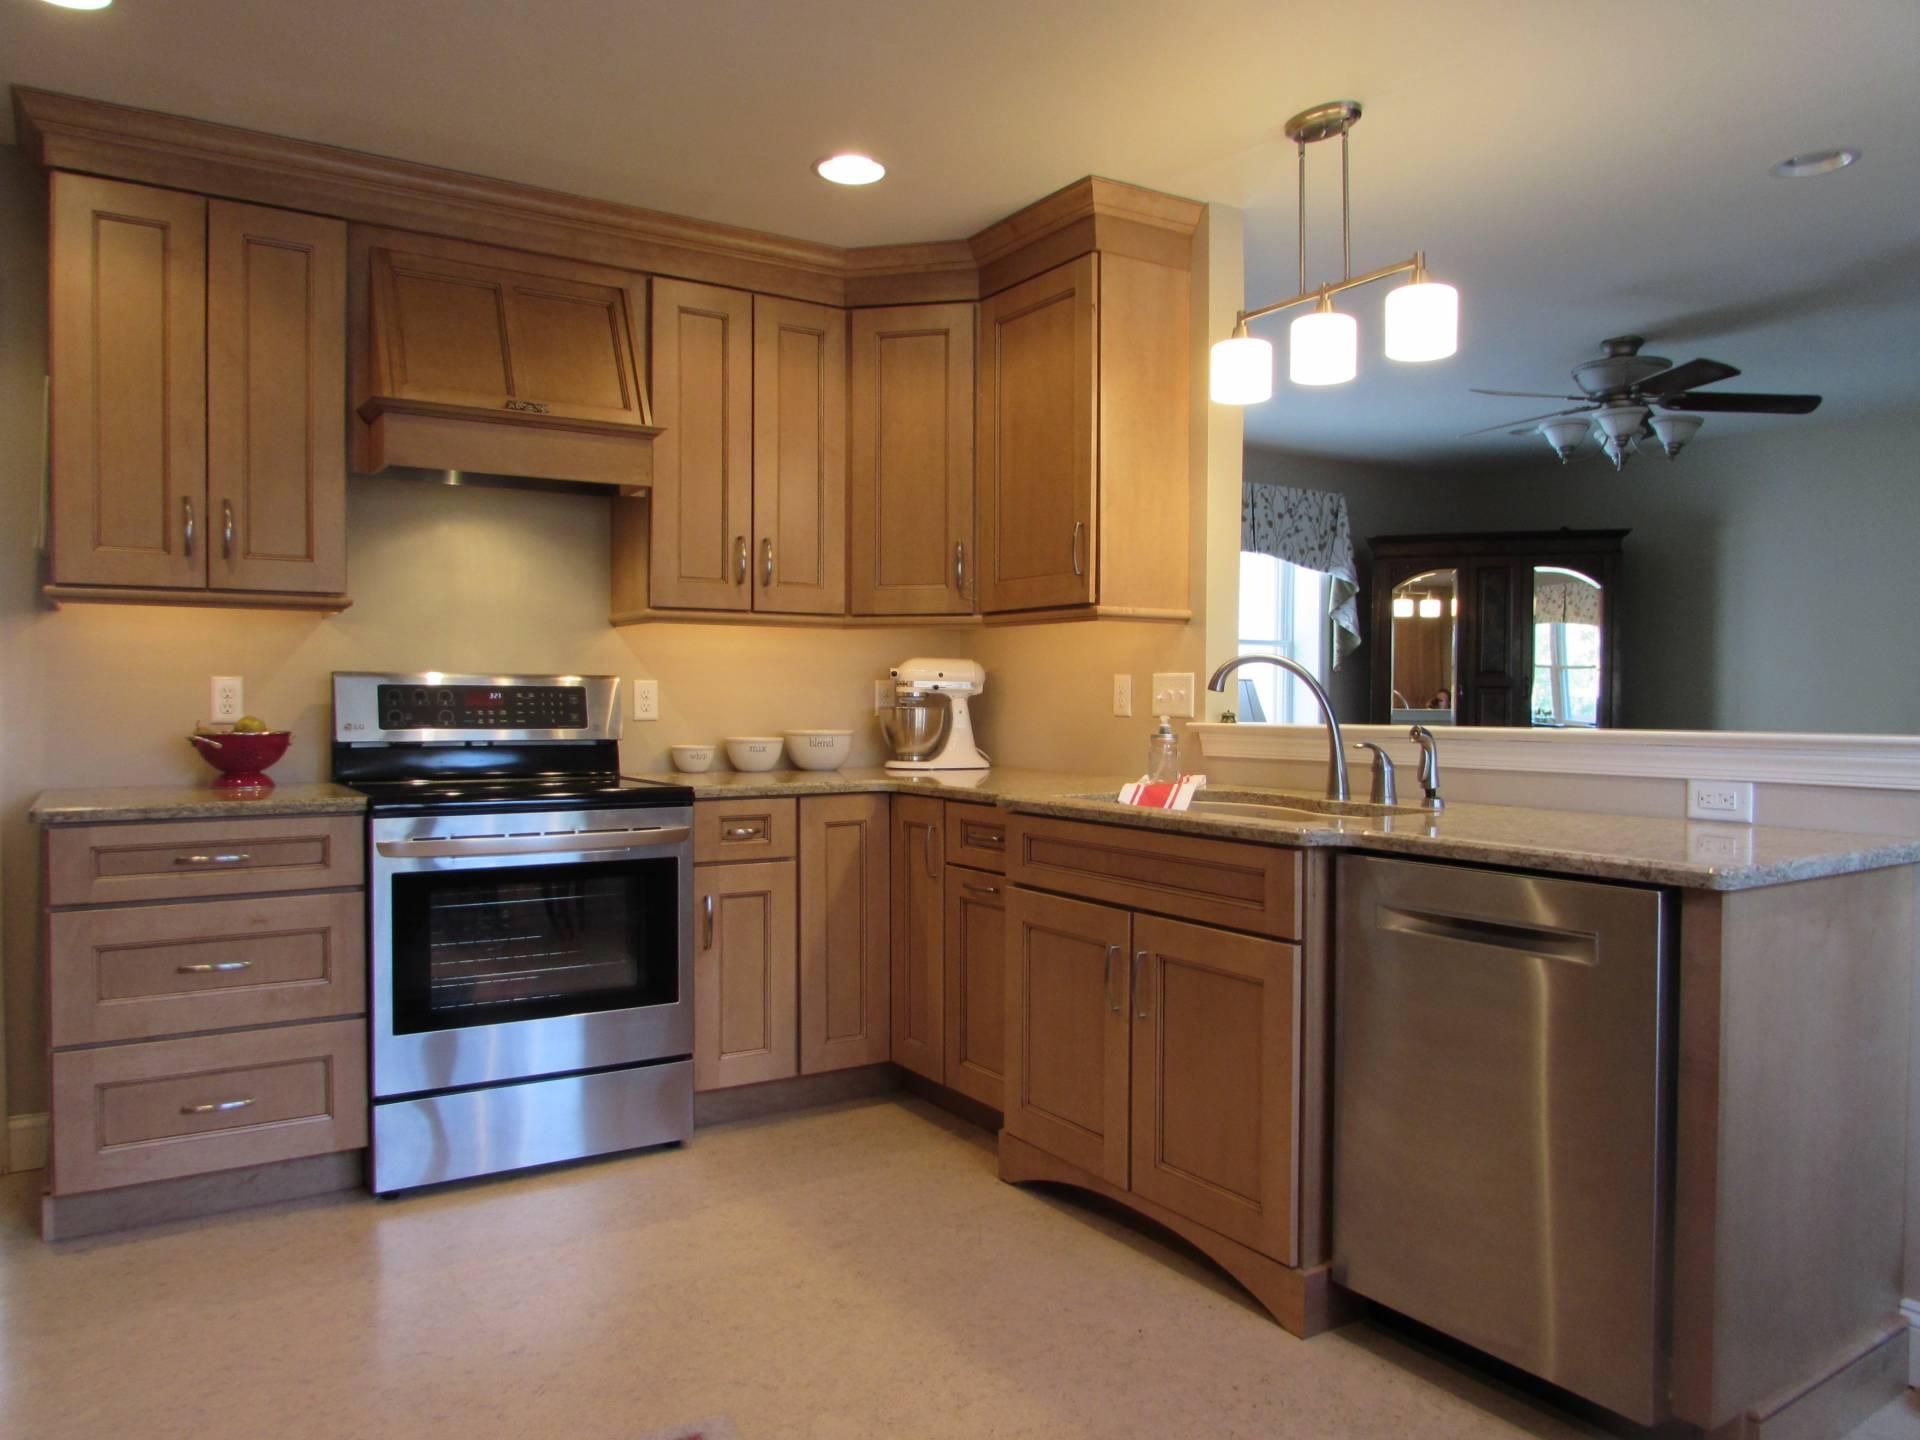 kitchen and bathroom remodeling kitchen remodeling york pa Lancaster Kitchen